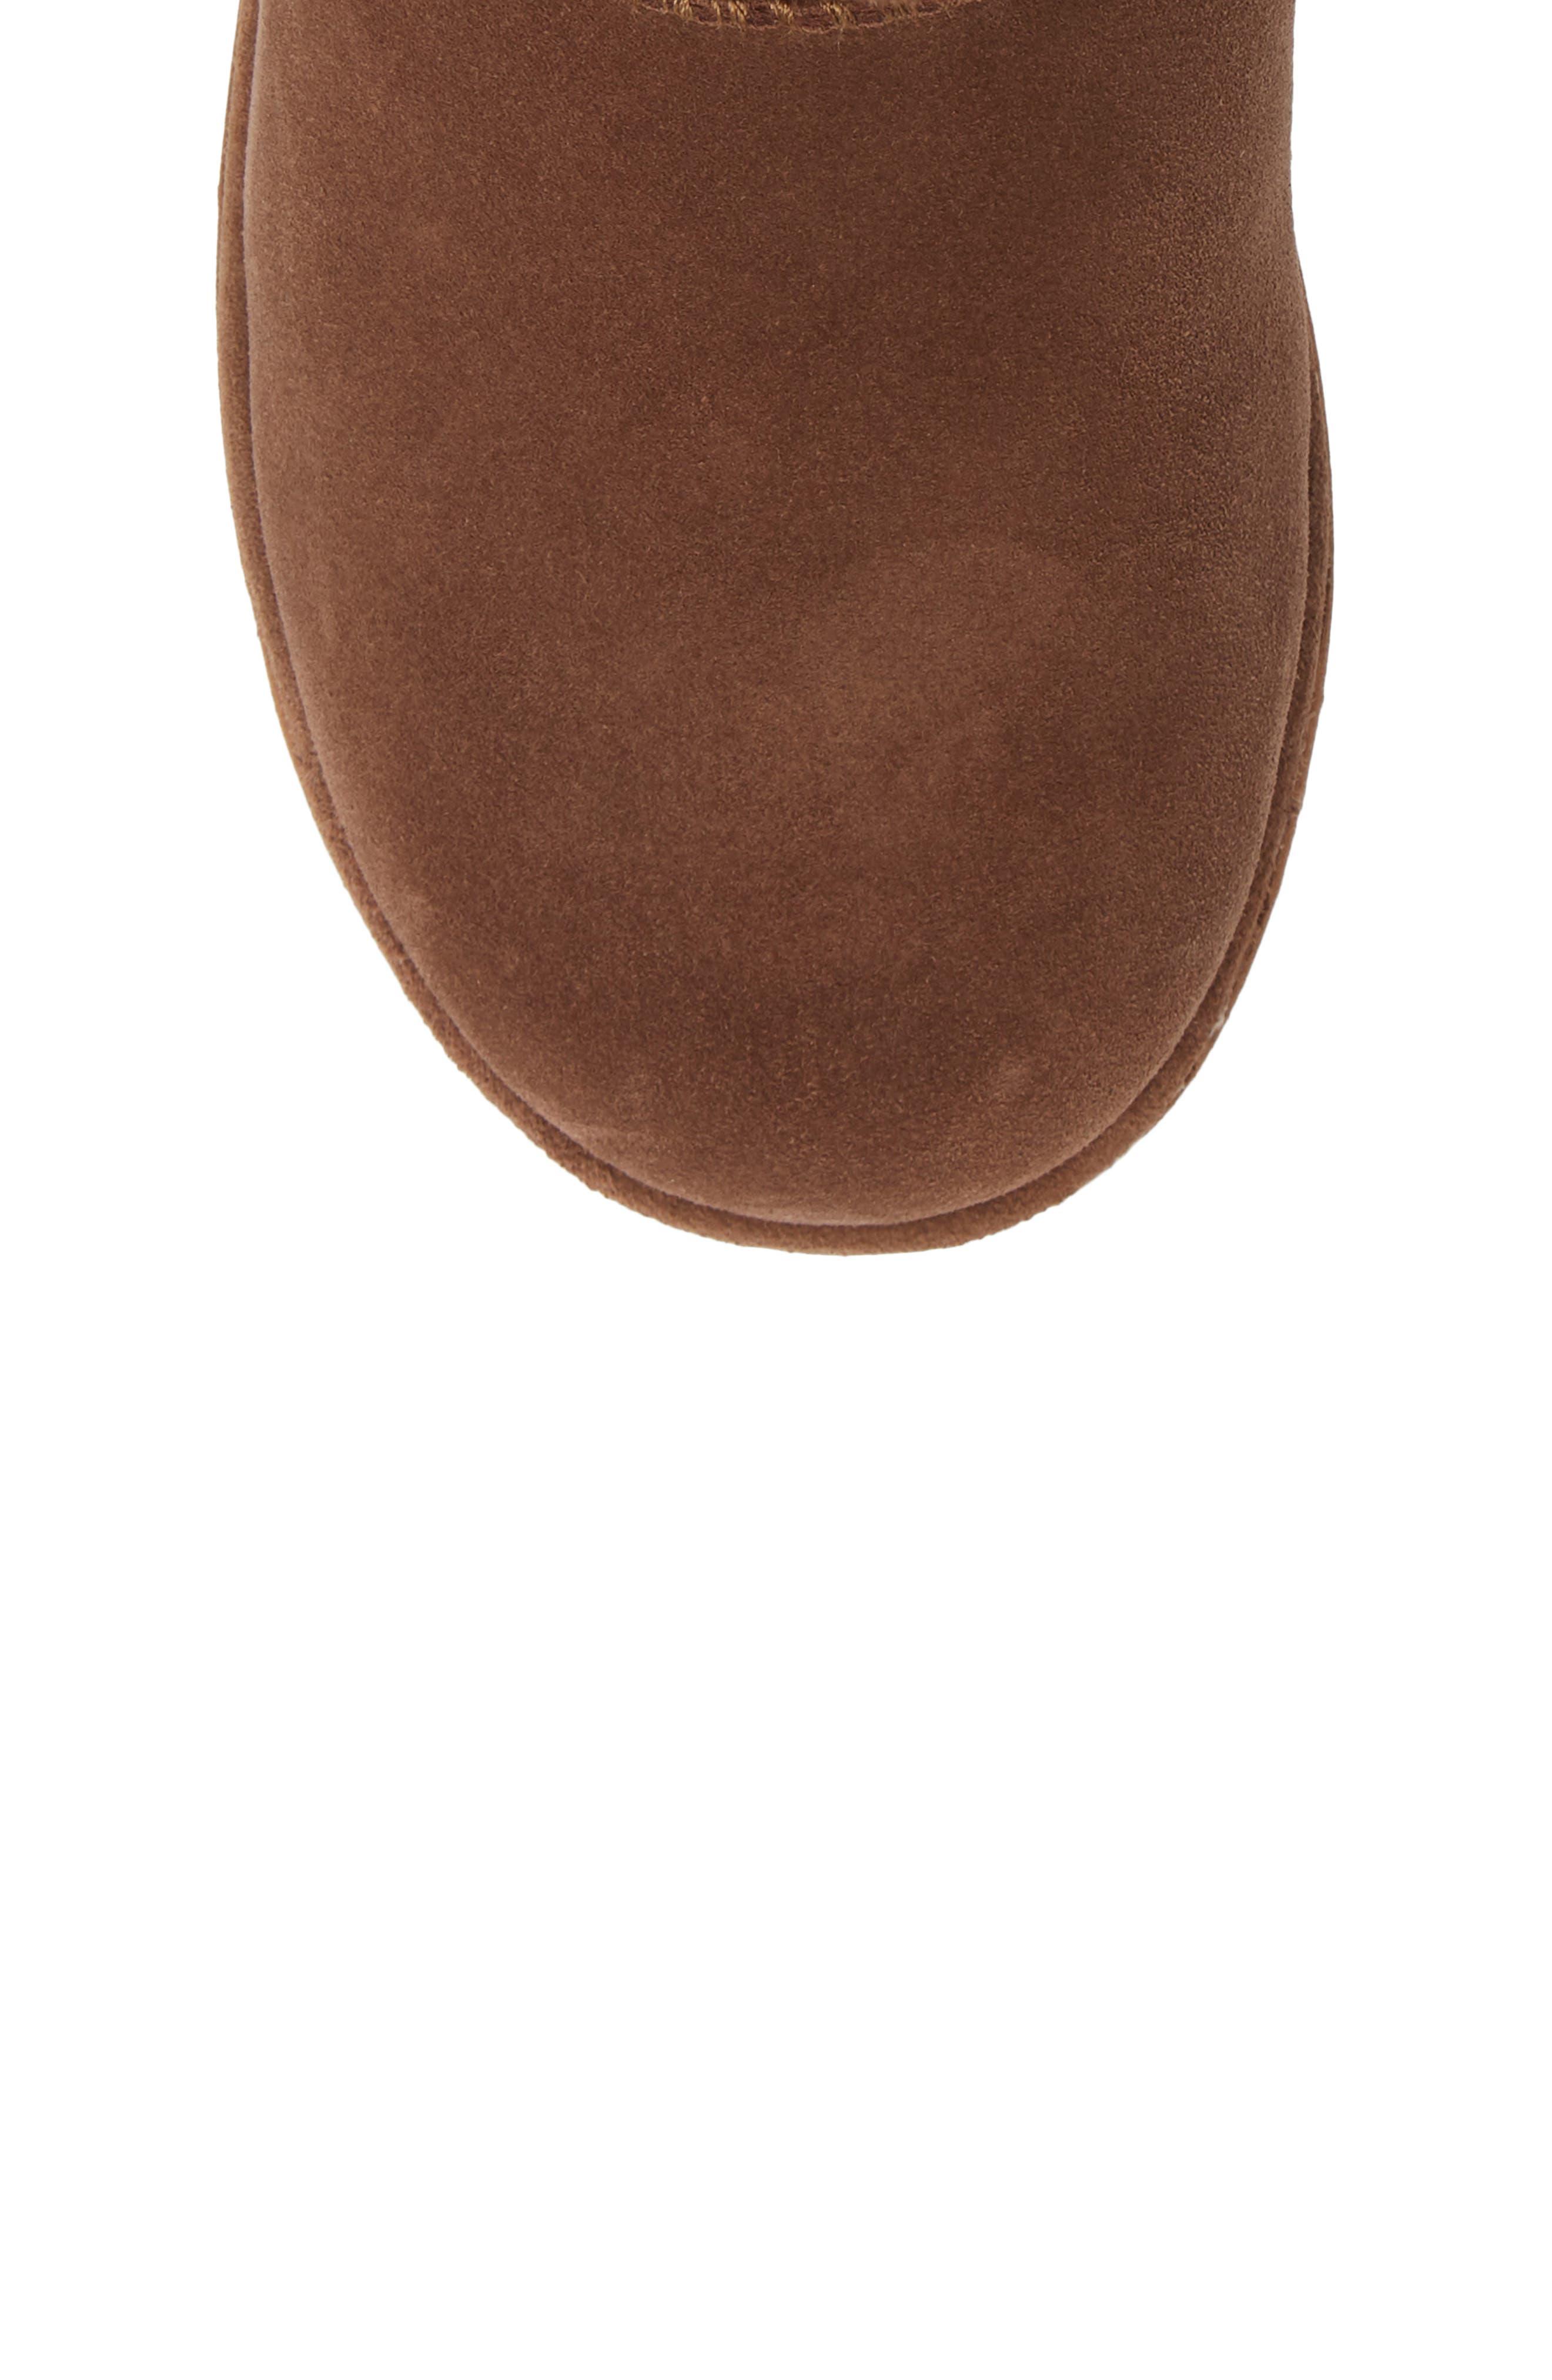 Brumby Waterproof Boot,                             Alternate thumbnail 6, color,                             Oak Brown